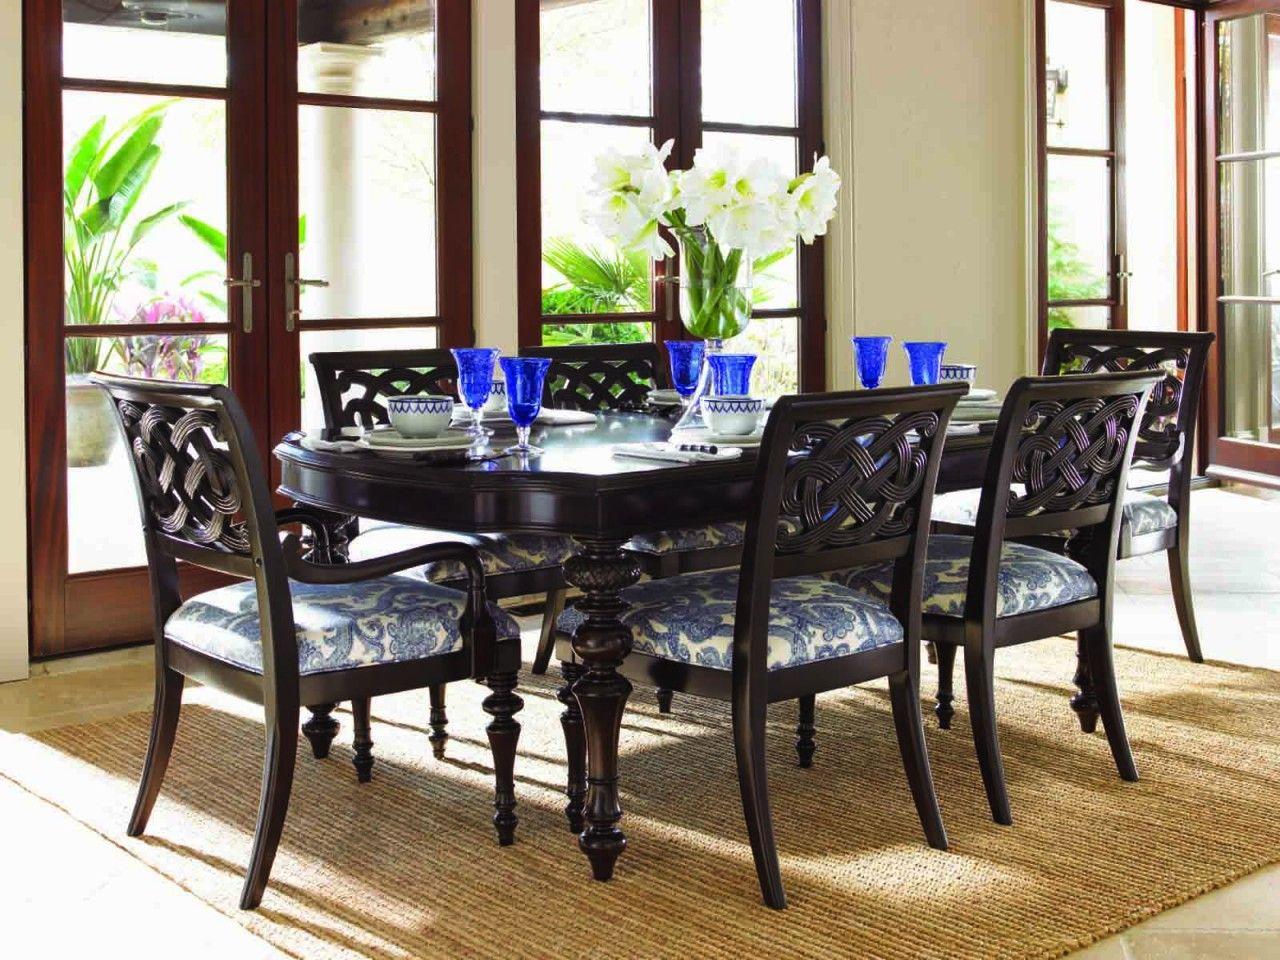 Lexington Tommy Bahama Royal Kahala Islands Edge Dining Table Set Vintage Dining Table Dining Table Dining Table In Kitchen